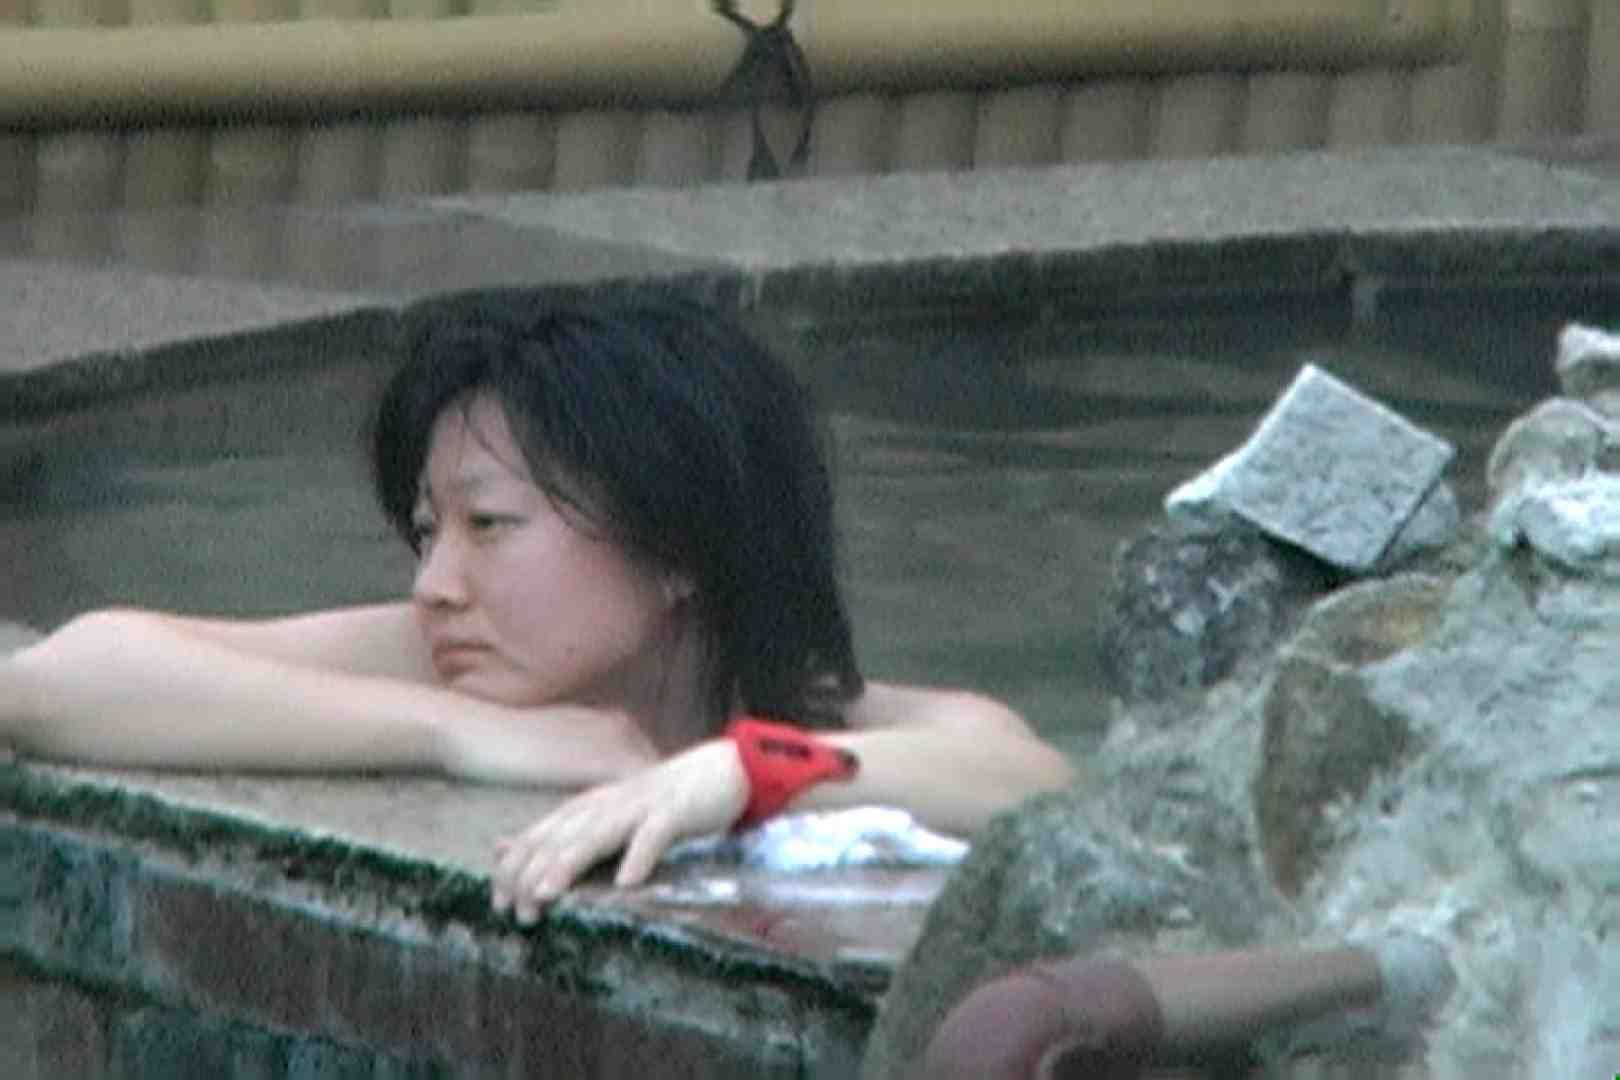 Aquaな露天風呂Vol.649 0  102連発 14